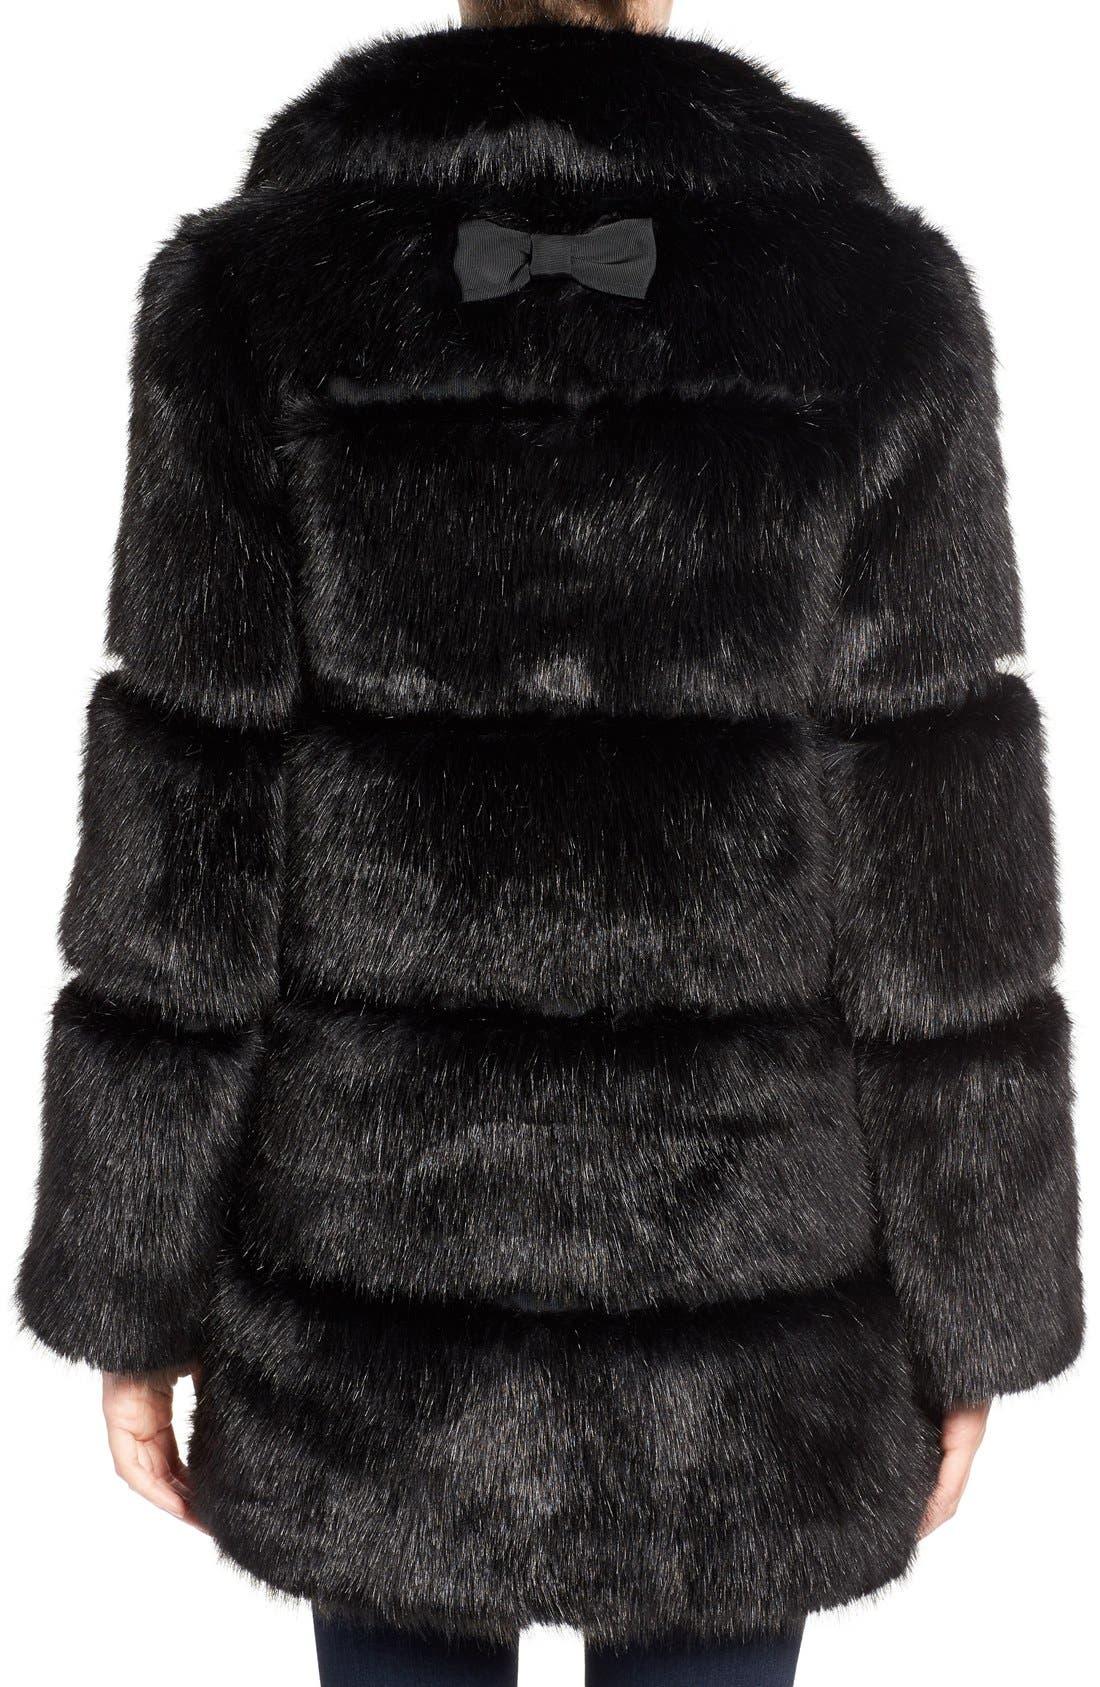 grooved faux fur coat,                             Alternate thumbnail 3, color,                             001